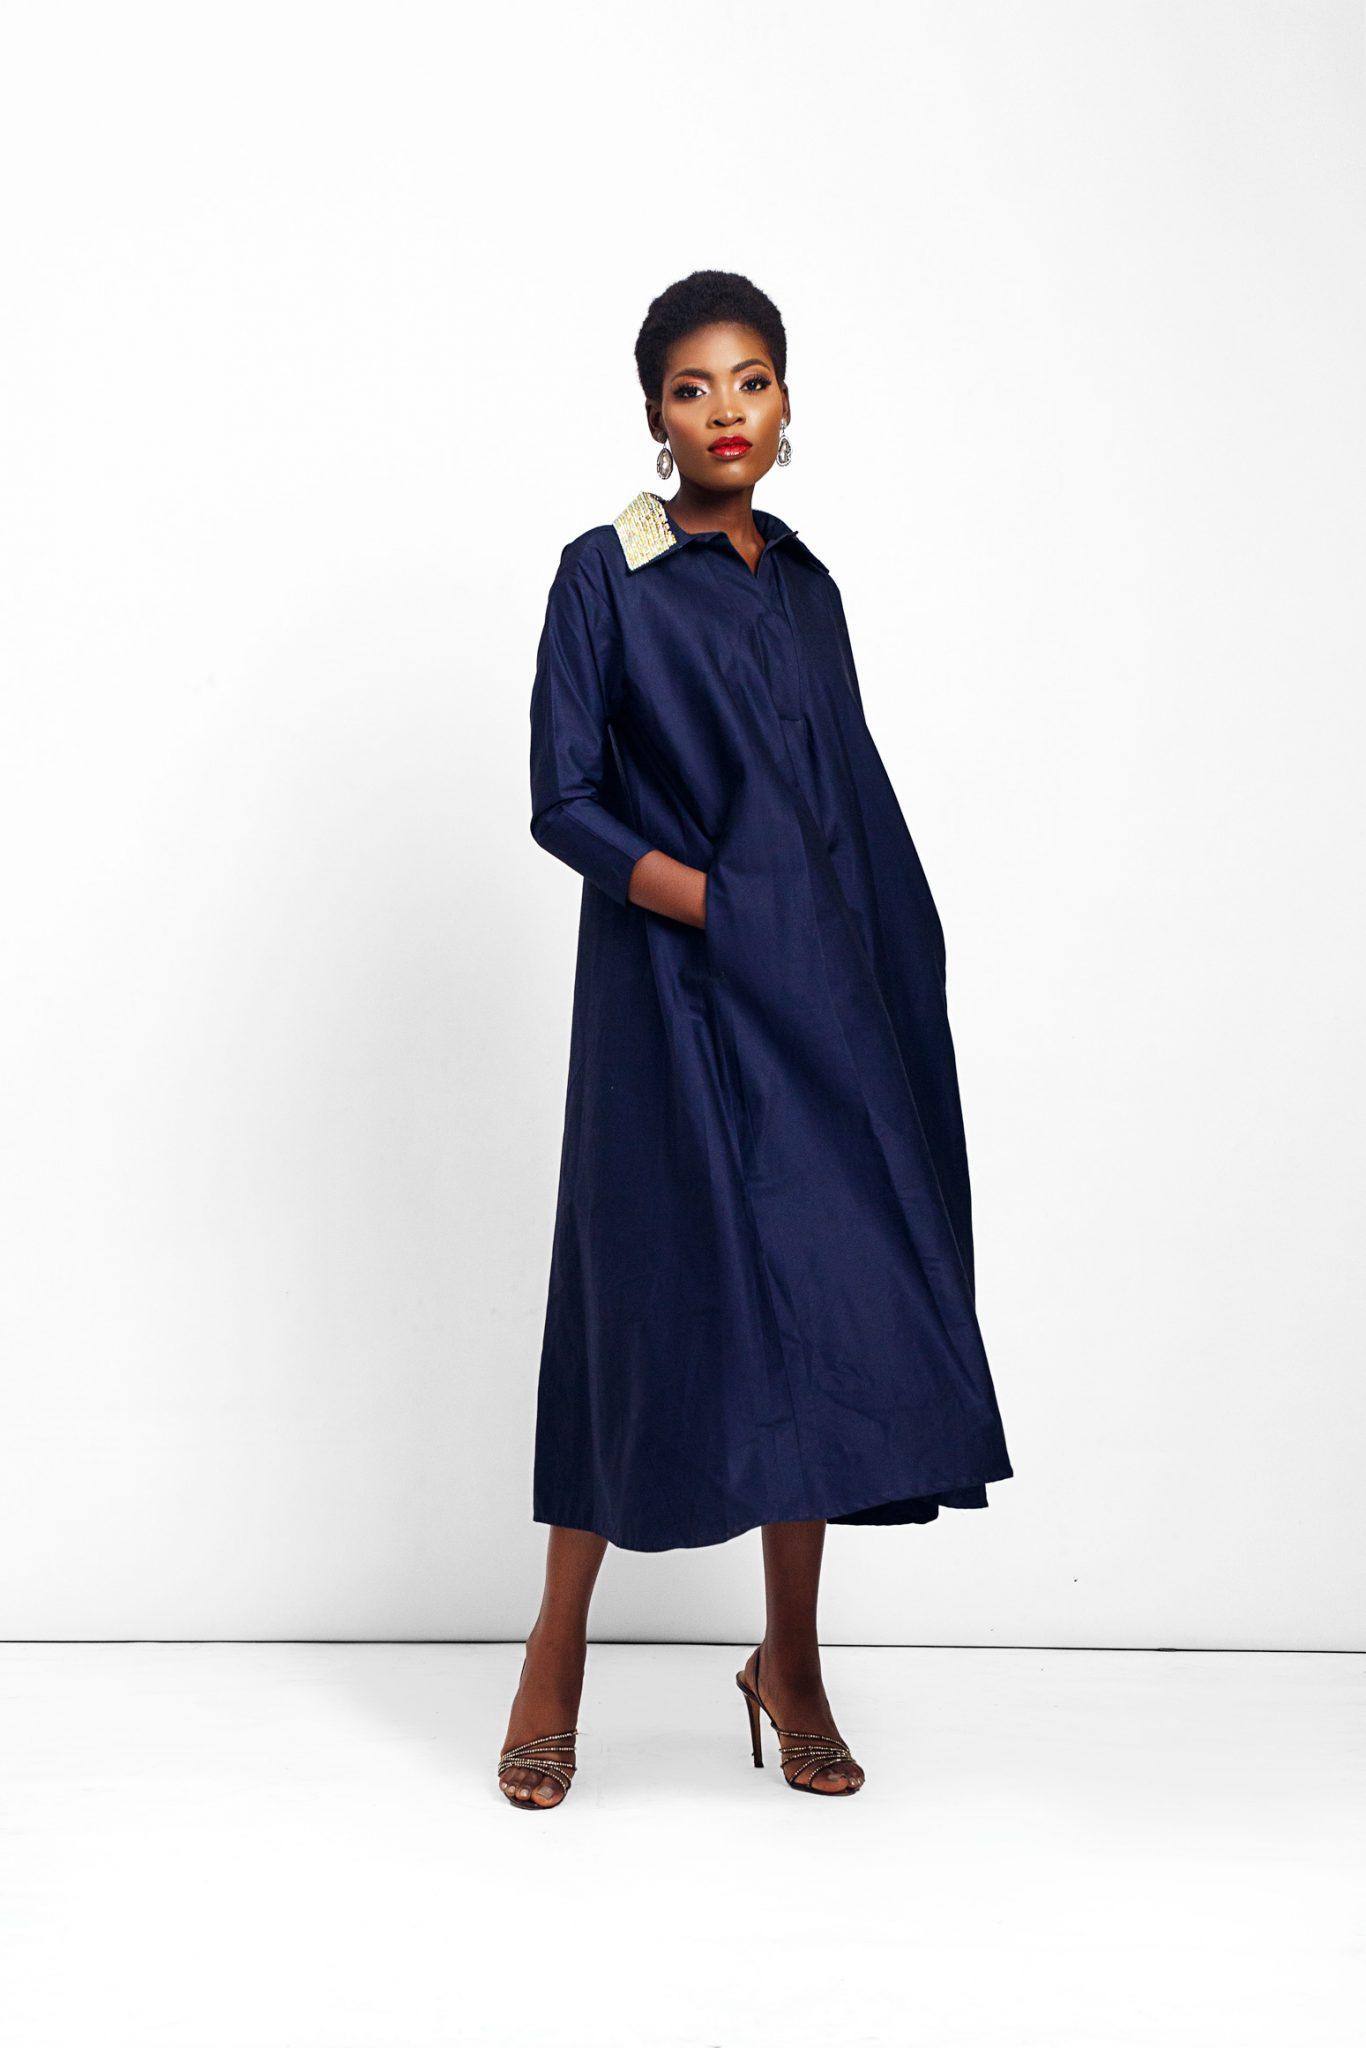 Oversized Shirt Dress with Embellished Collar Details